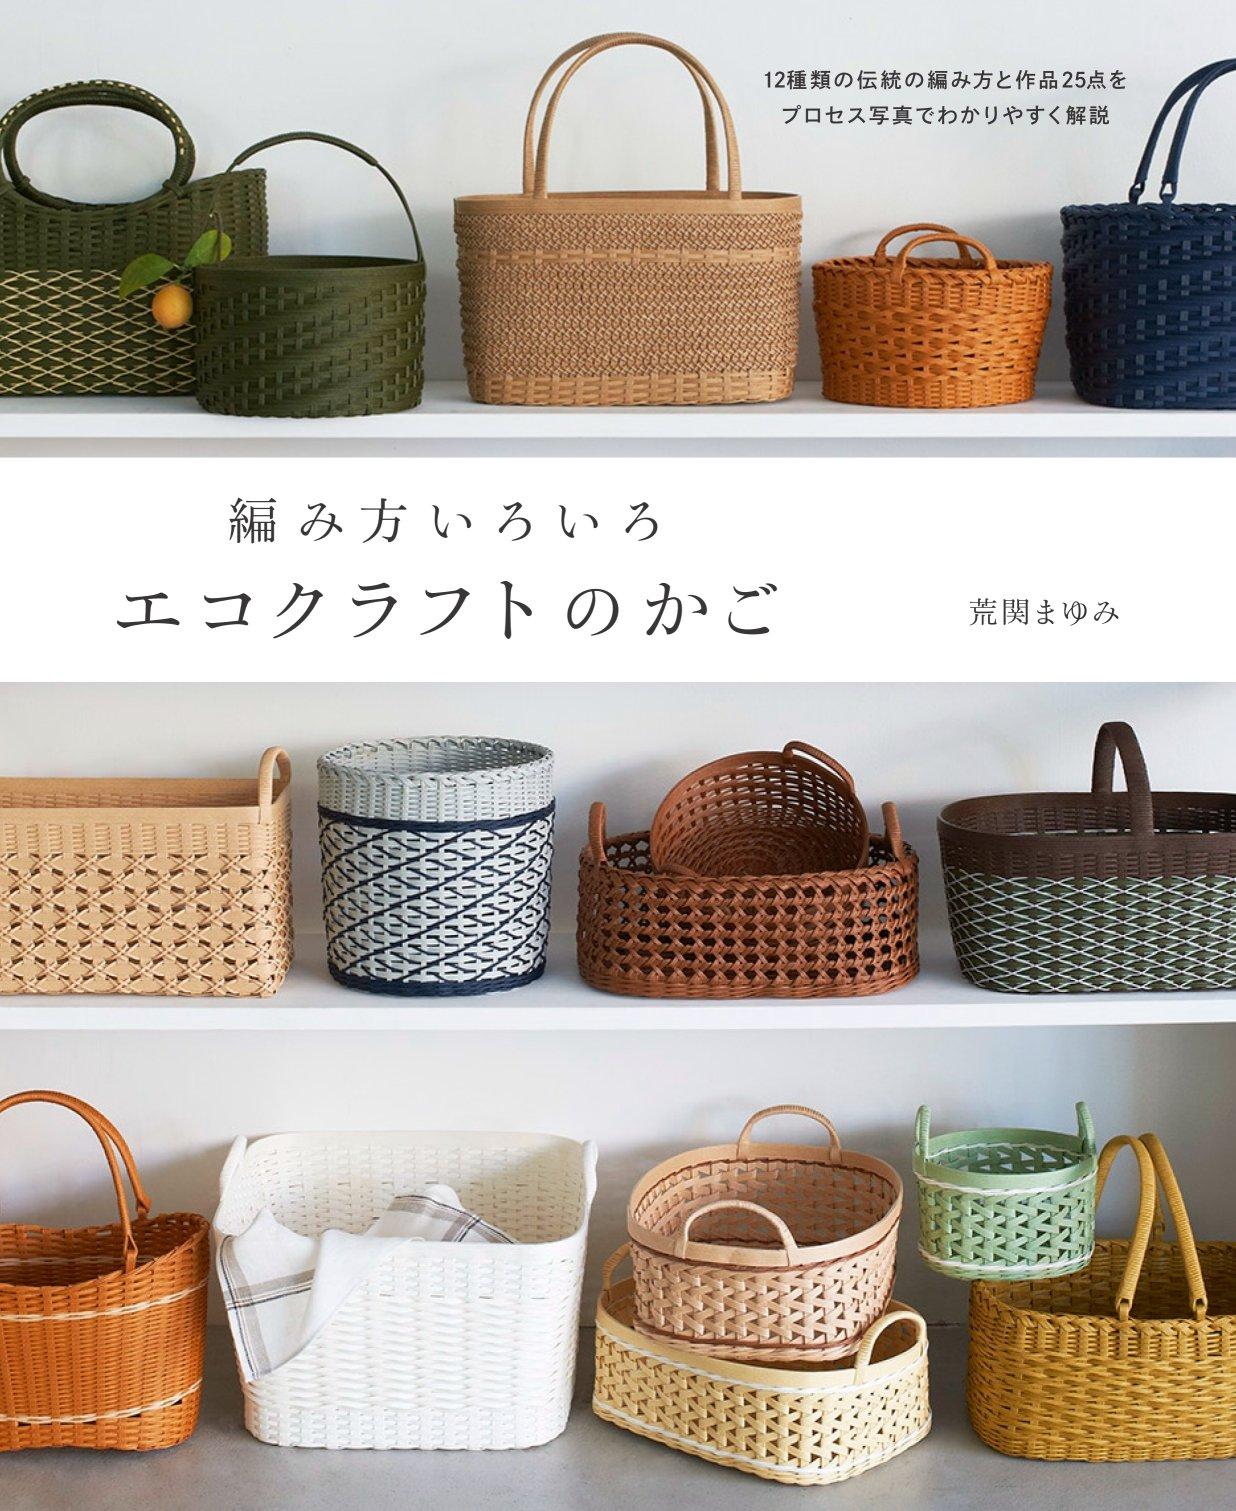 Basket of eco-Craft